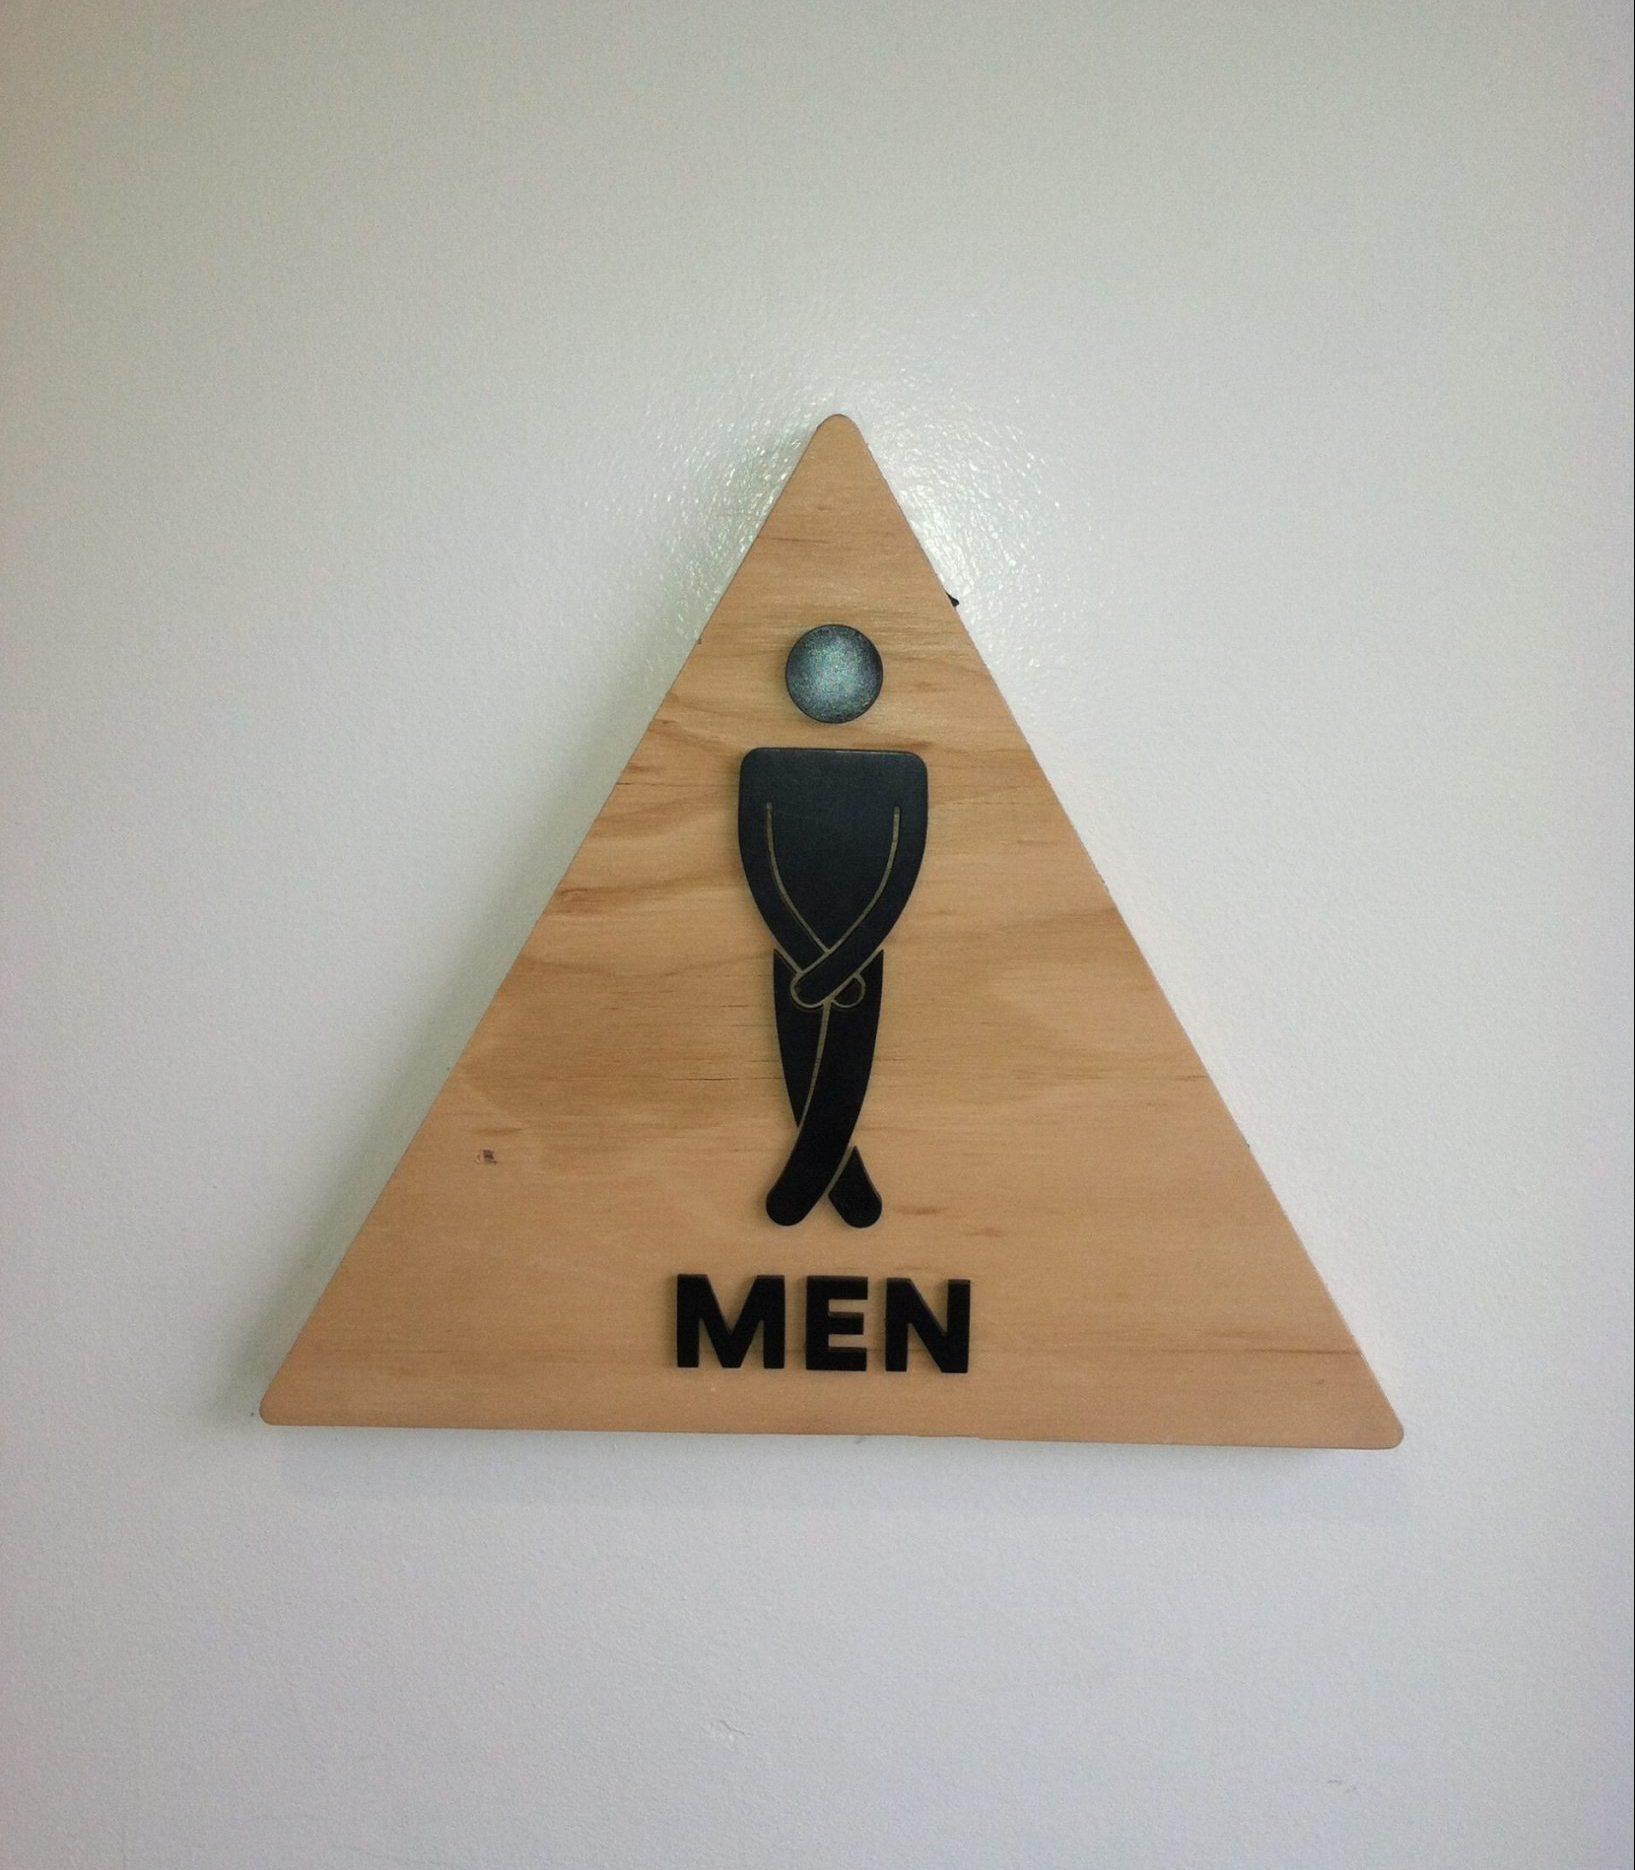 airbnb headquarters bathroom sign